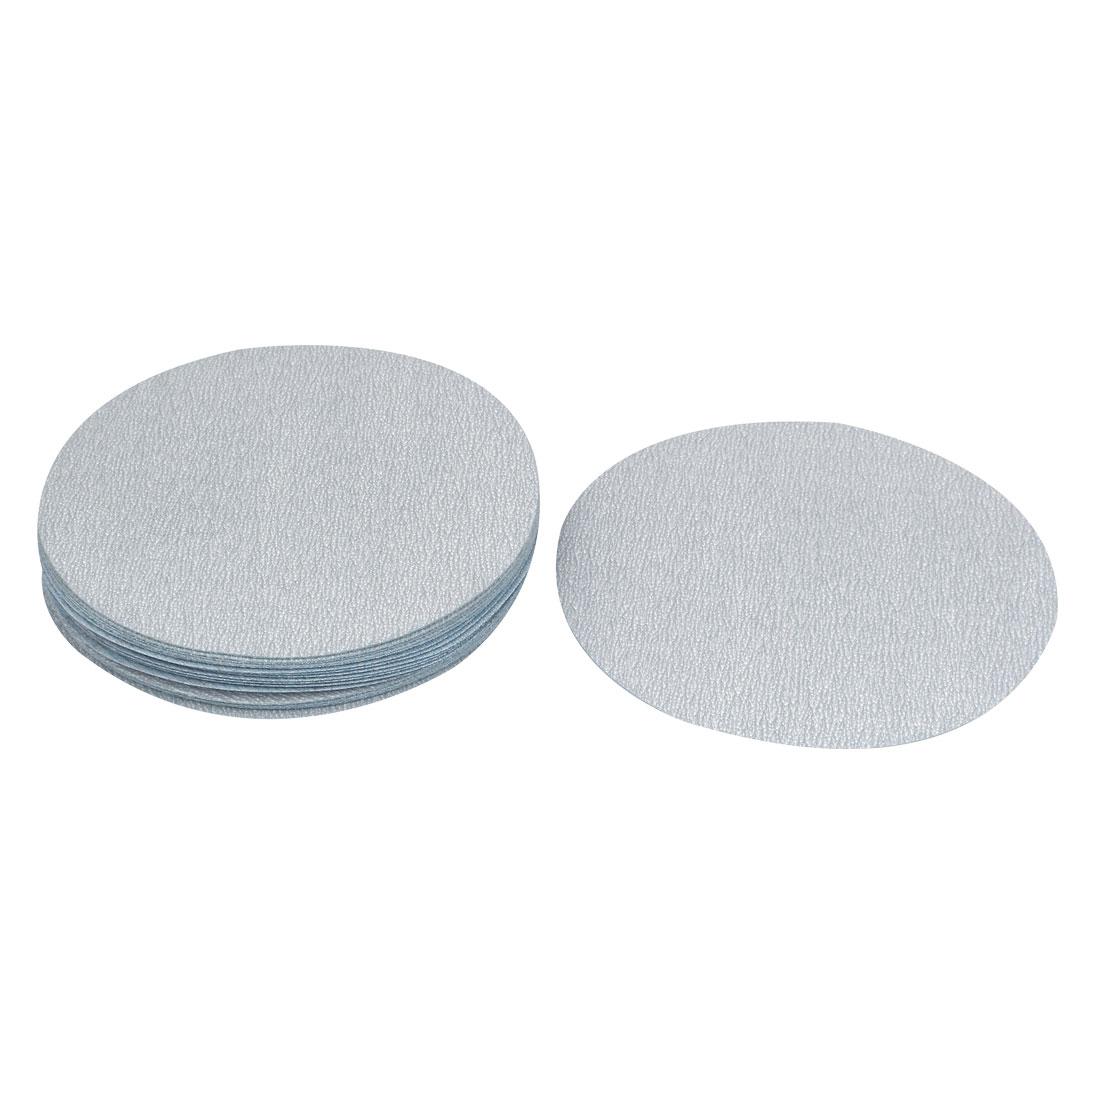 6inch Dia Round Dry Abrasive Sanding Flocking Sandpaper Sheet Disc 600 Grit 20 Pcs